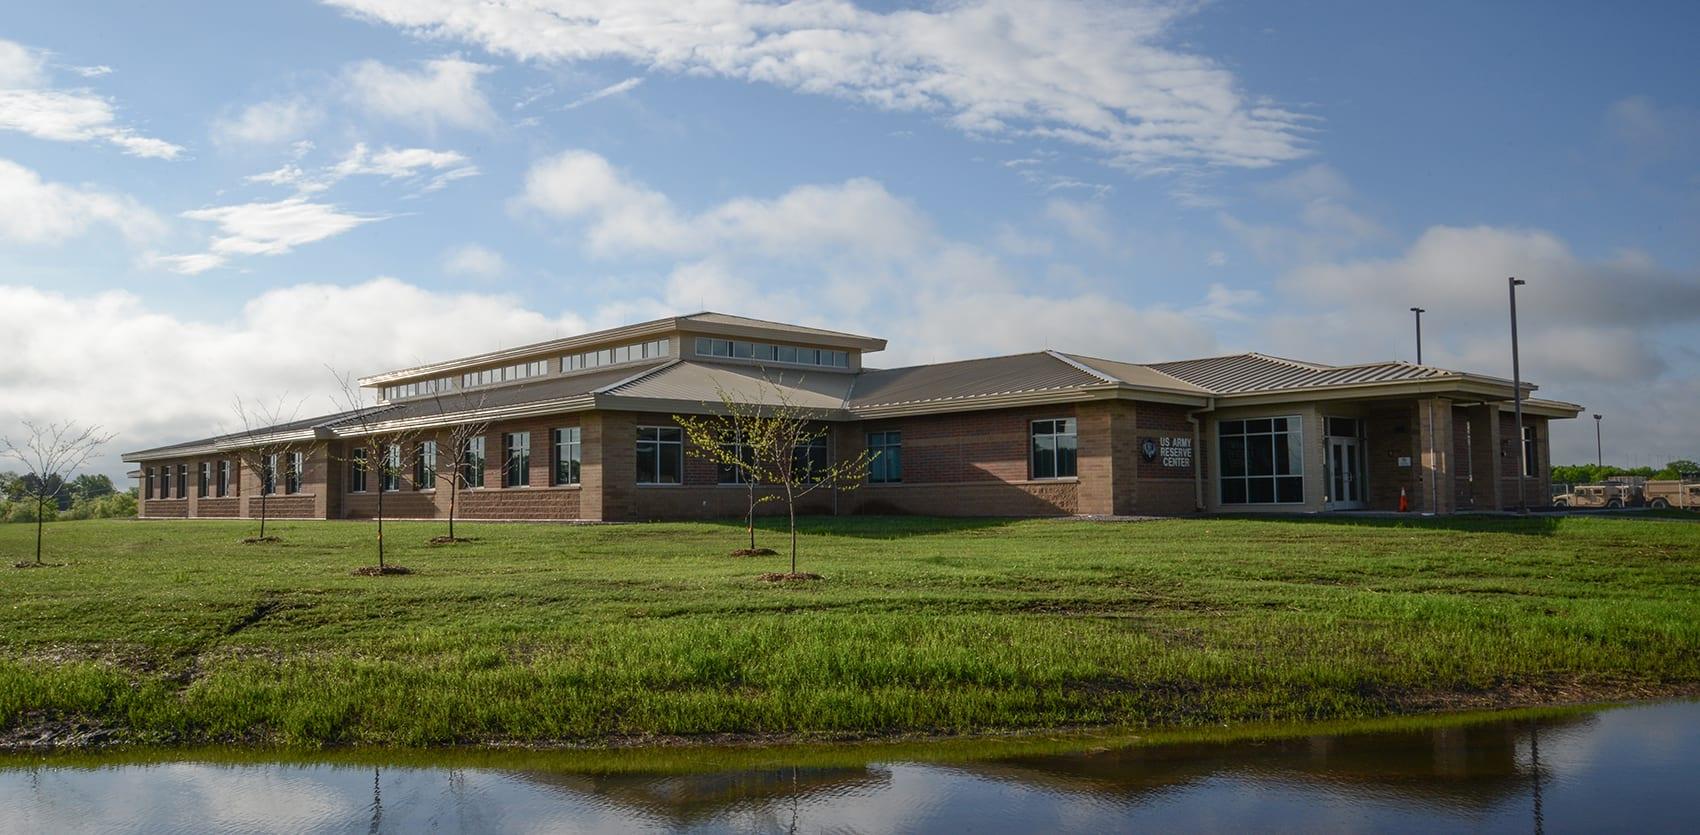 Saint Joseph Army Reserve Center